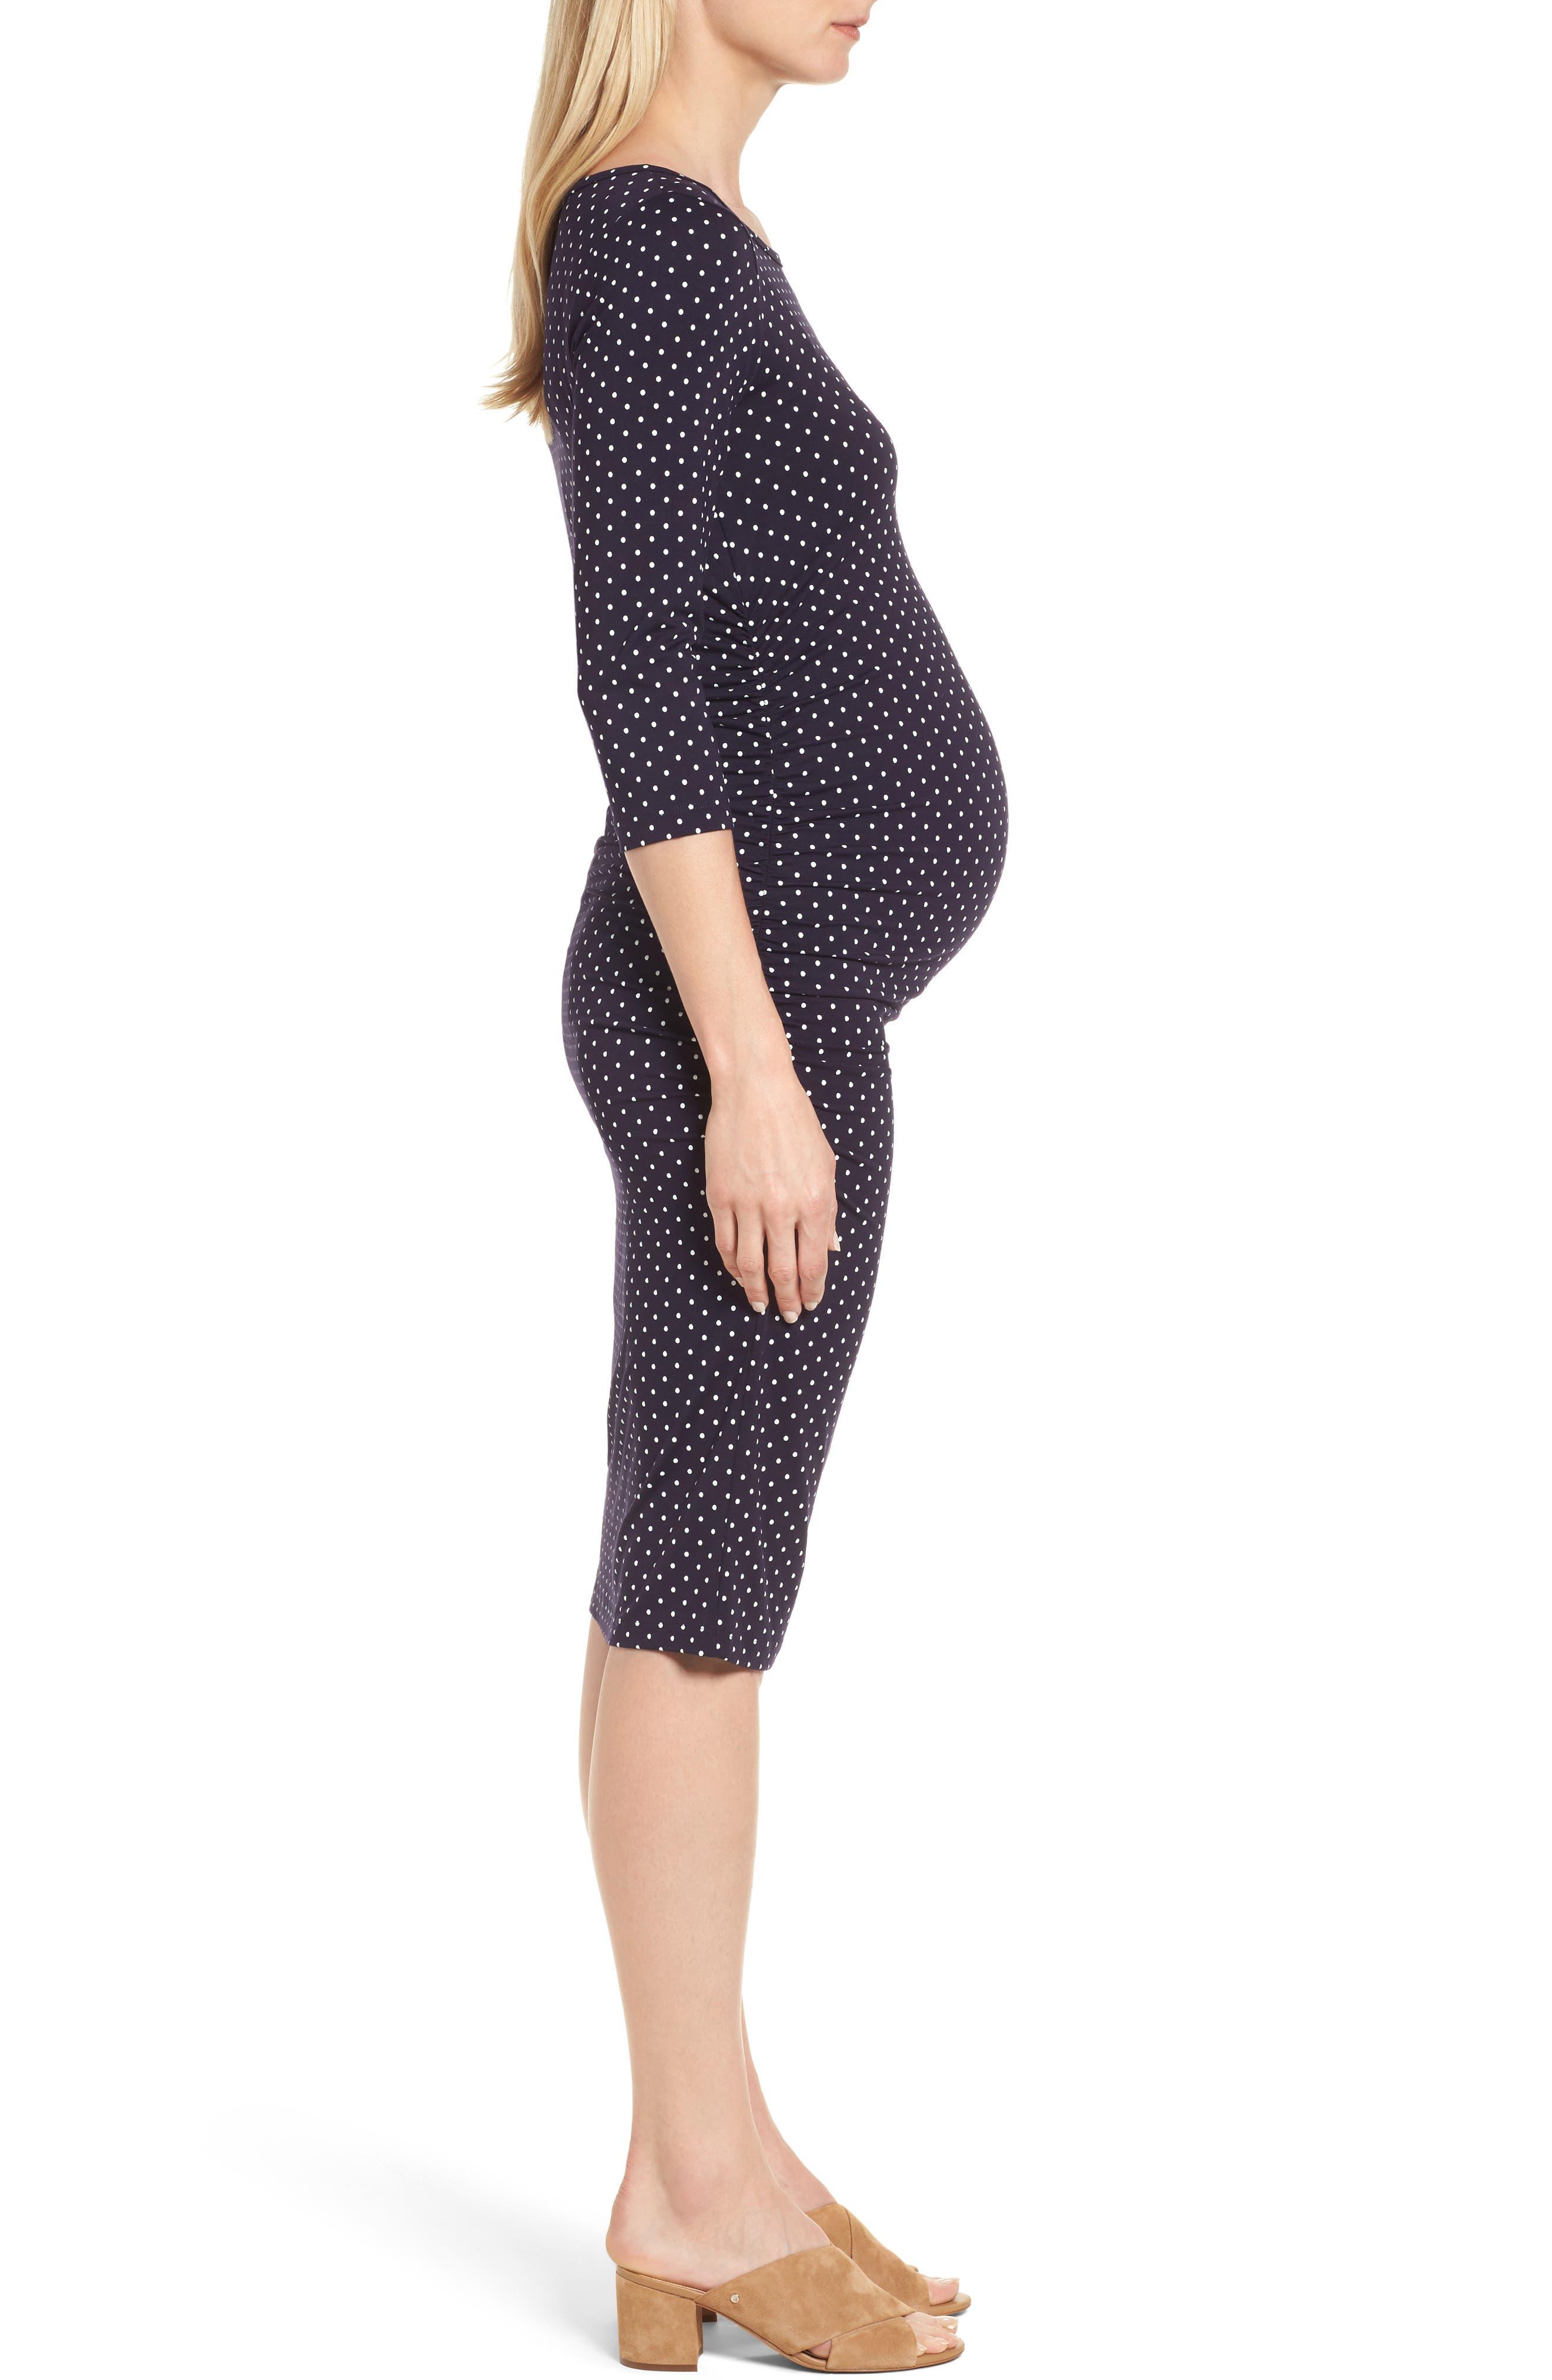 Jennifer Dot Ruched Maternity Dress,                             Alternate thumbnail 3, color,                             NAVY POLKA PRINT